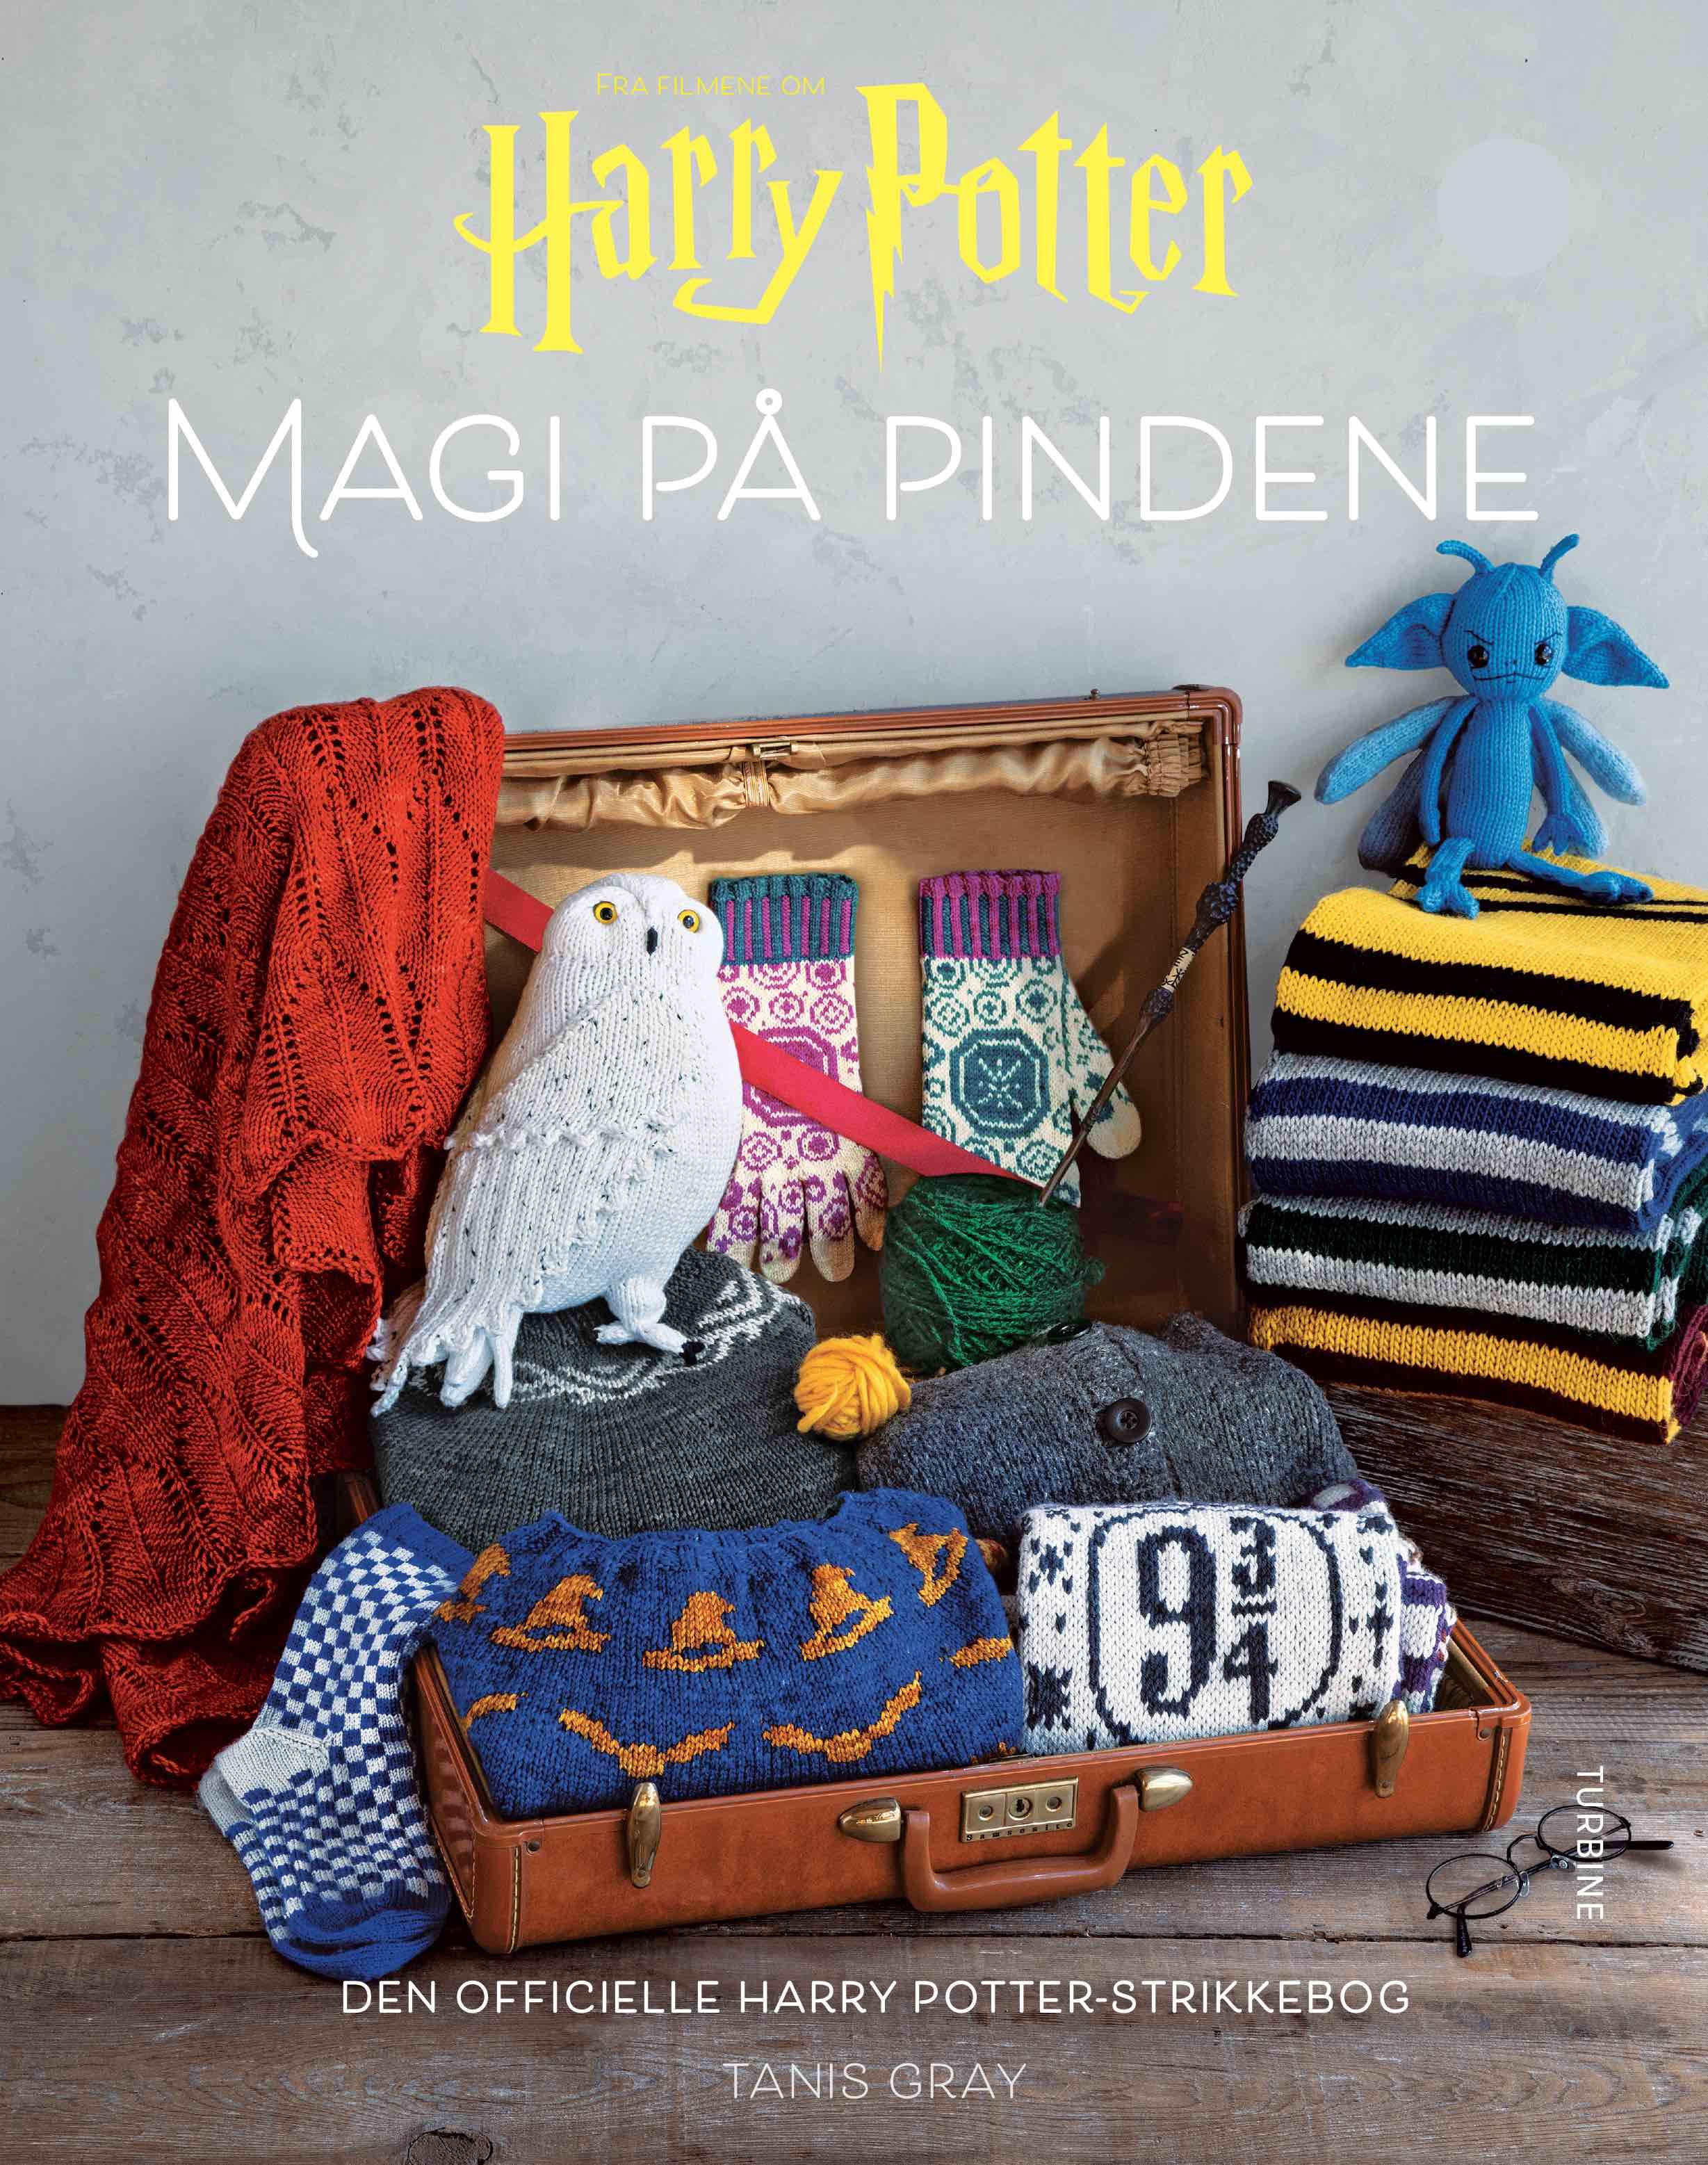 Harry Potter: Magi på pindene - Tanis Gray - Bøger - Turbine - 9788740661026 - 15/6-2020